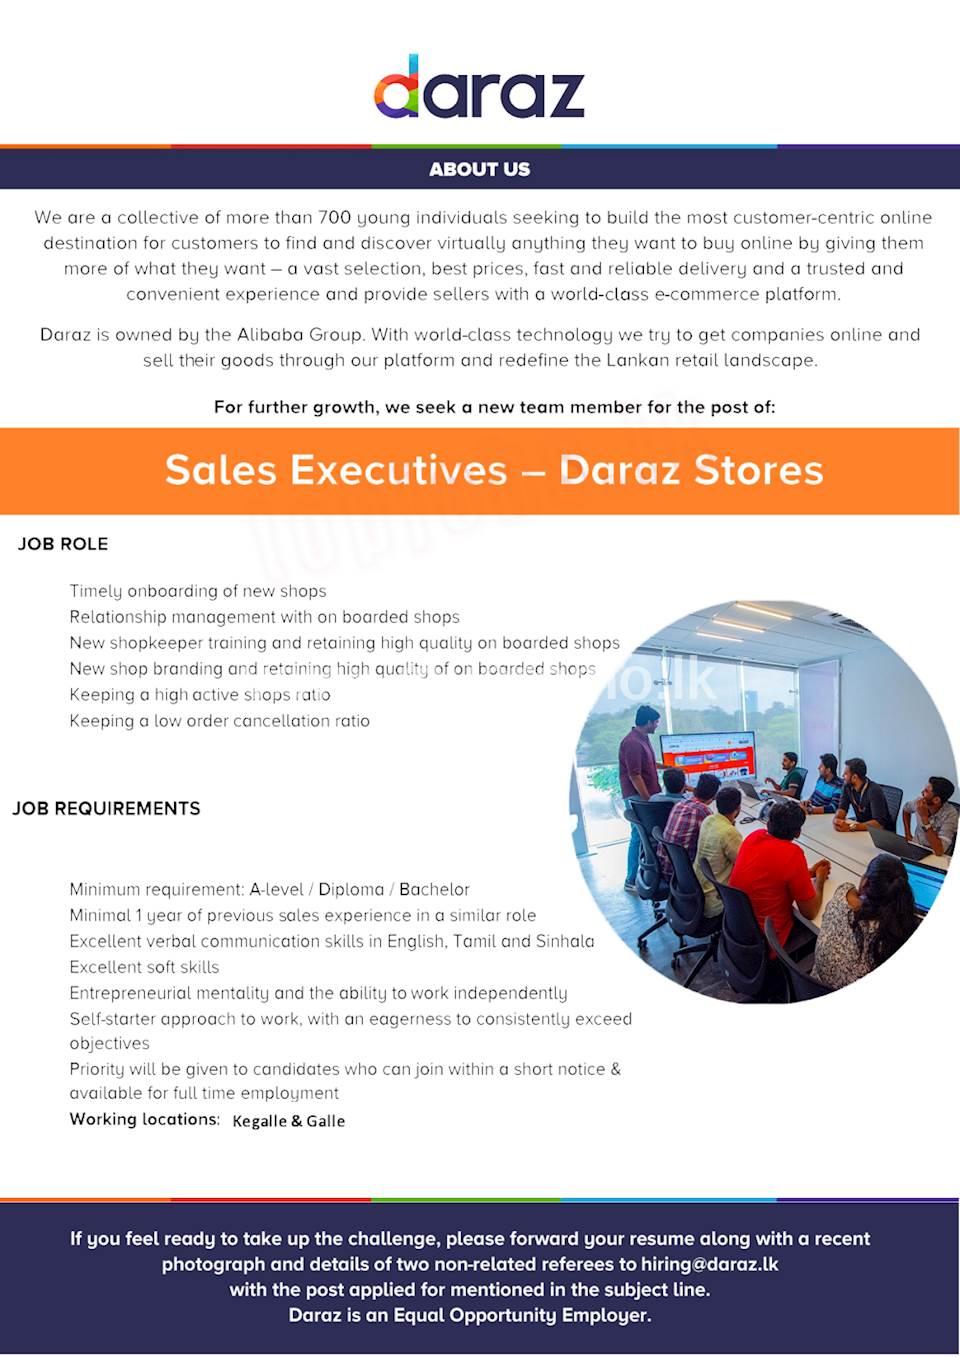 Sales Executives - Daraz Stores